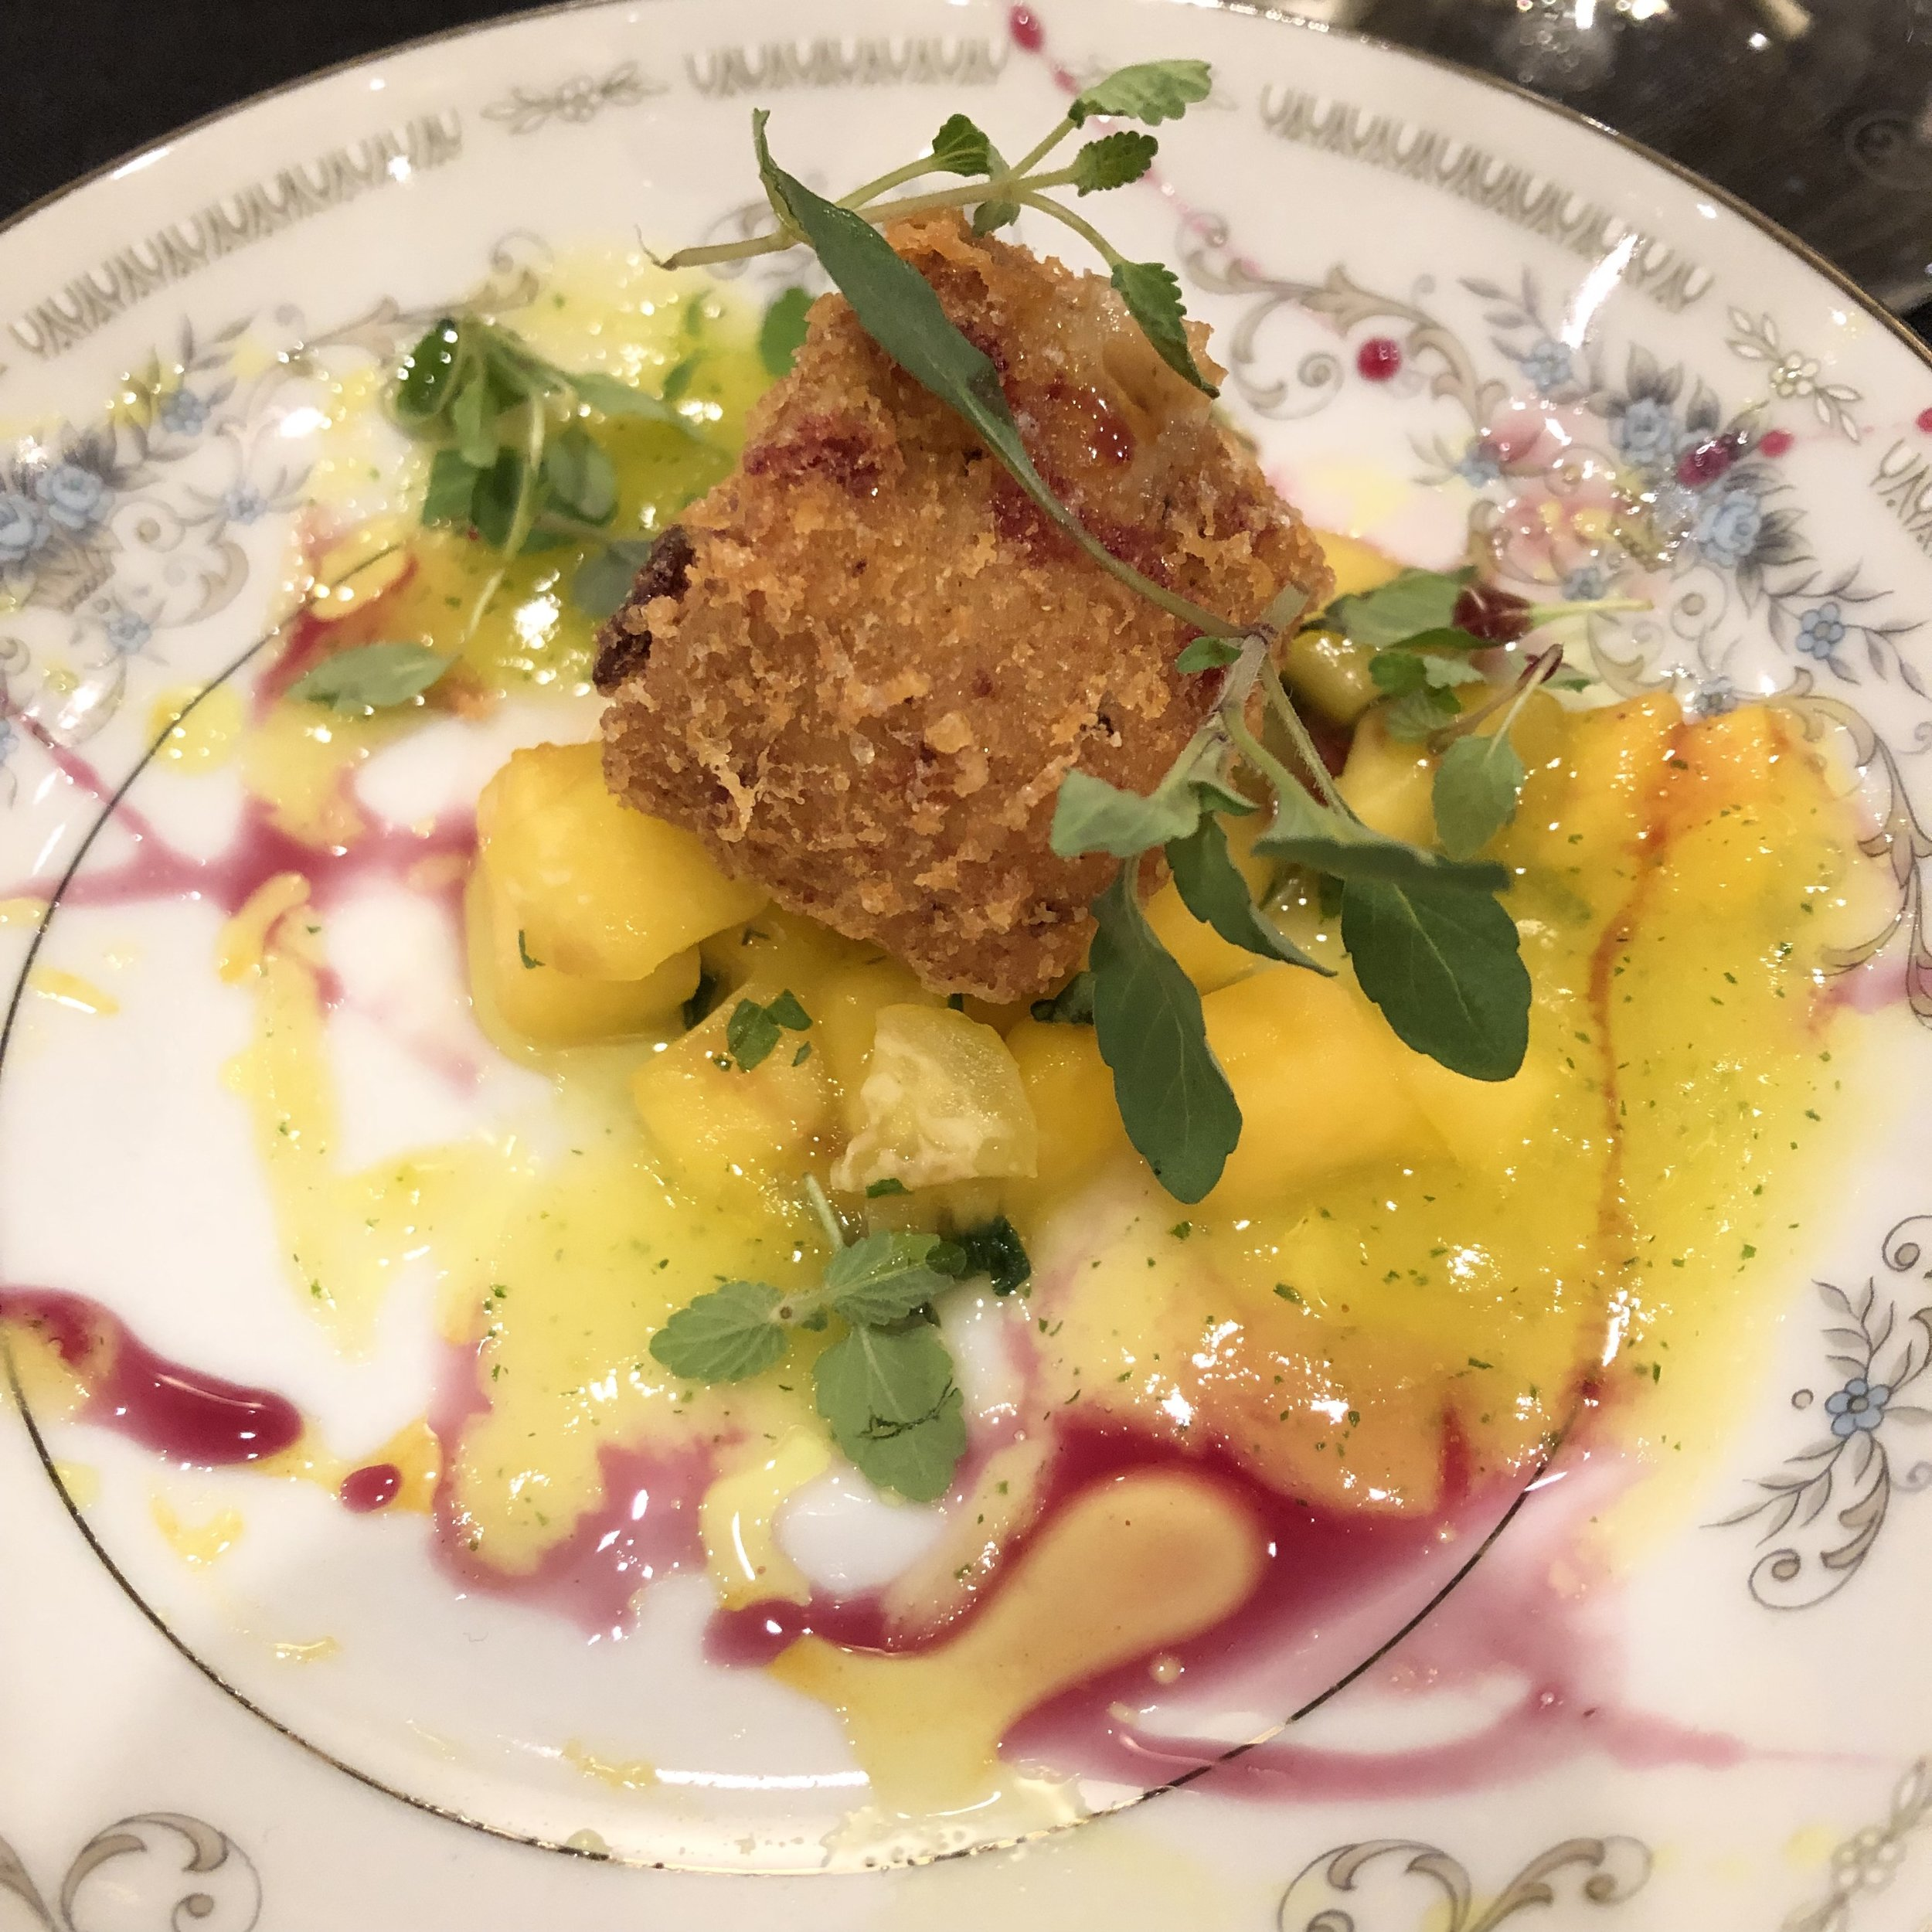 Amuse-bouche of crispy brie with mango mint salsa.